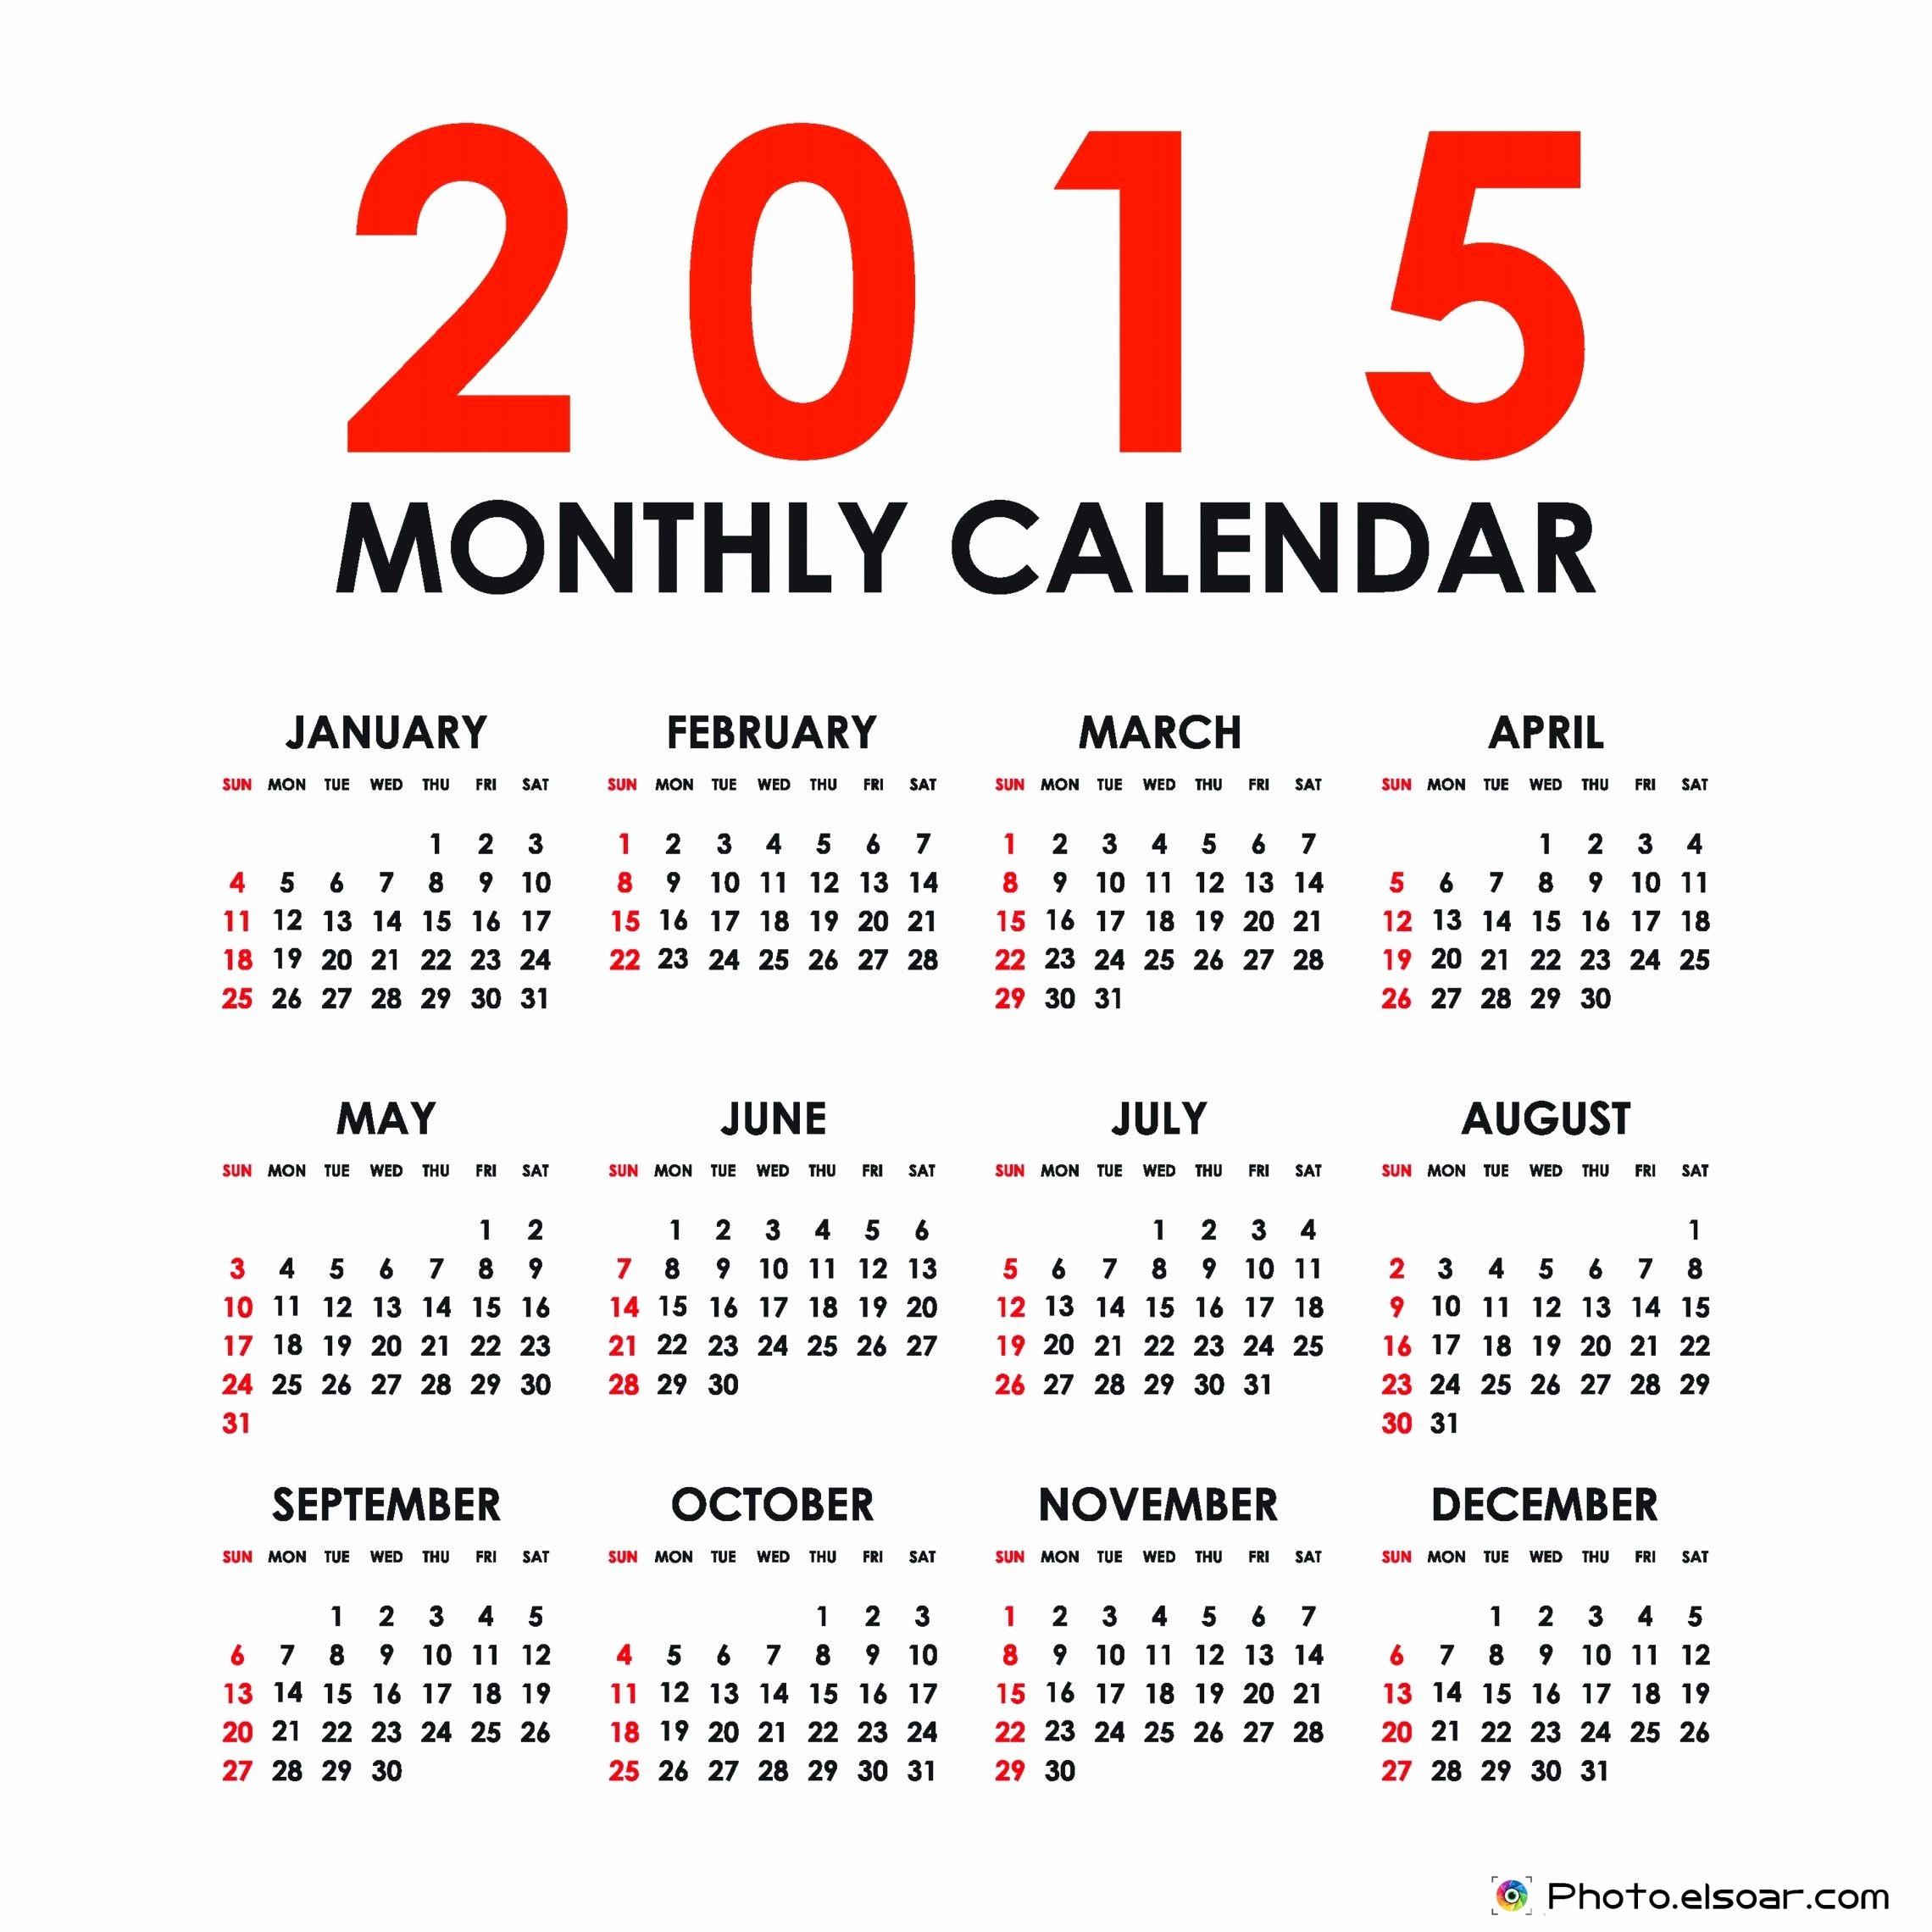 Printable 3 Month Calendar 2015 Inspirational Ipad 2015 Calendar for Wallpaper Large